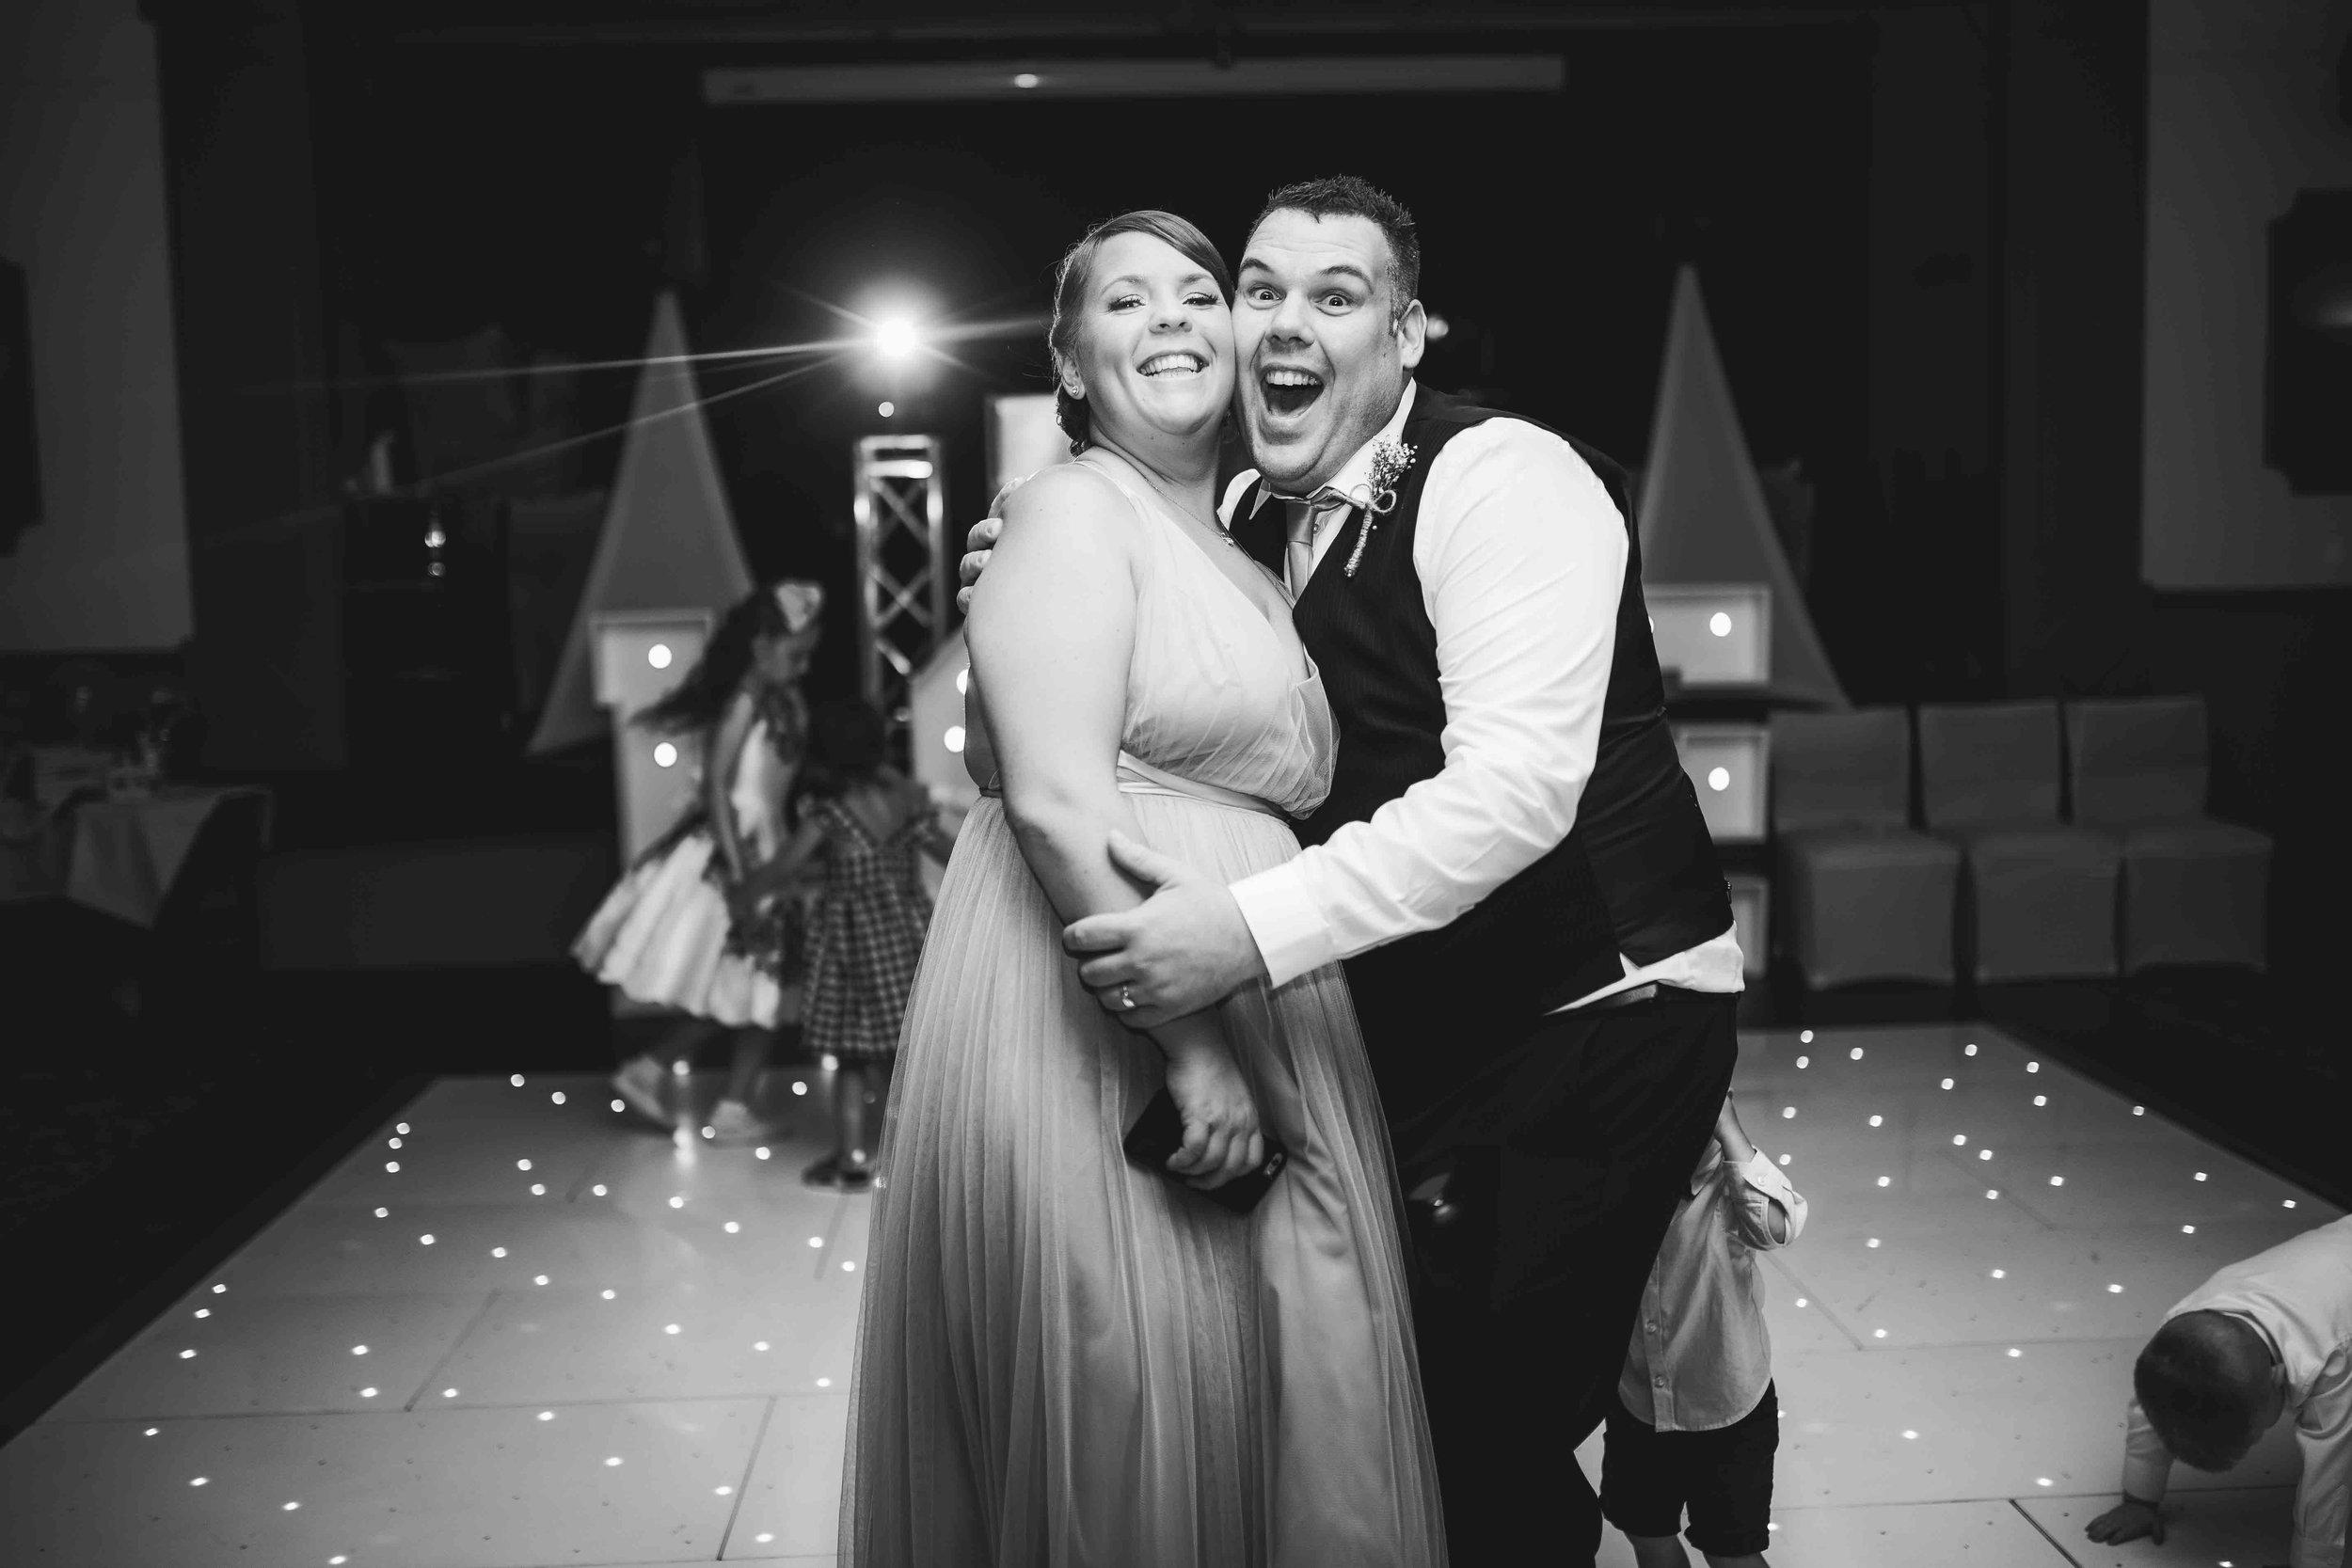 Lea-cooper-photography-willenhall-wolverhampton-wedding-photographer-birmingham-shirley-west-midlands-ceremony-church-16.JPG